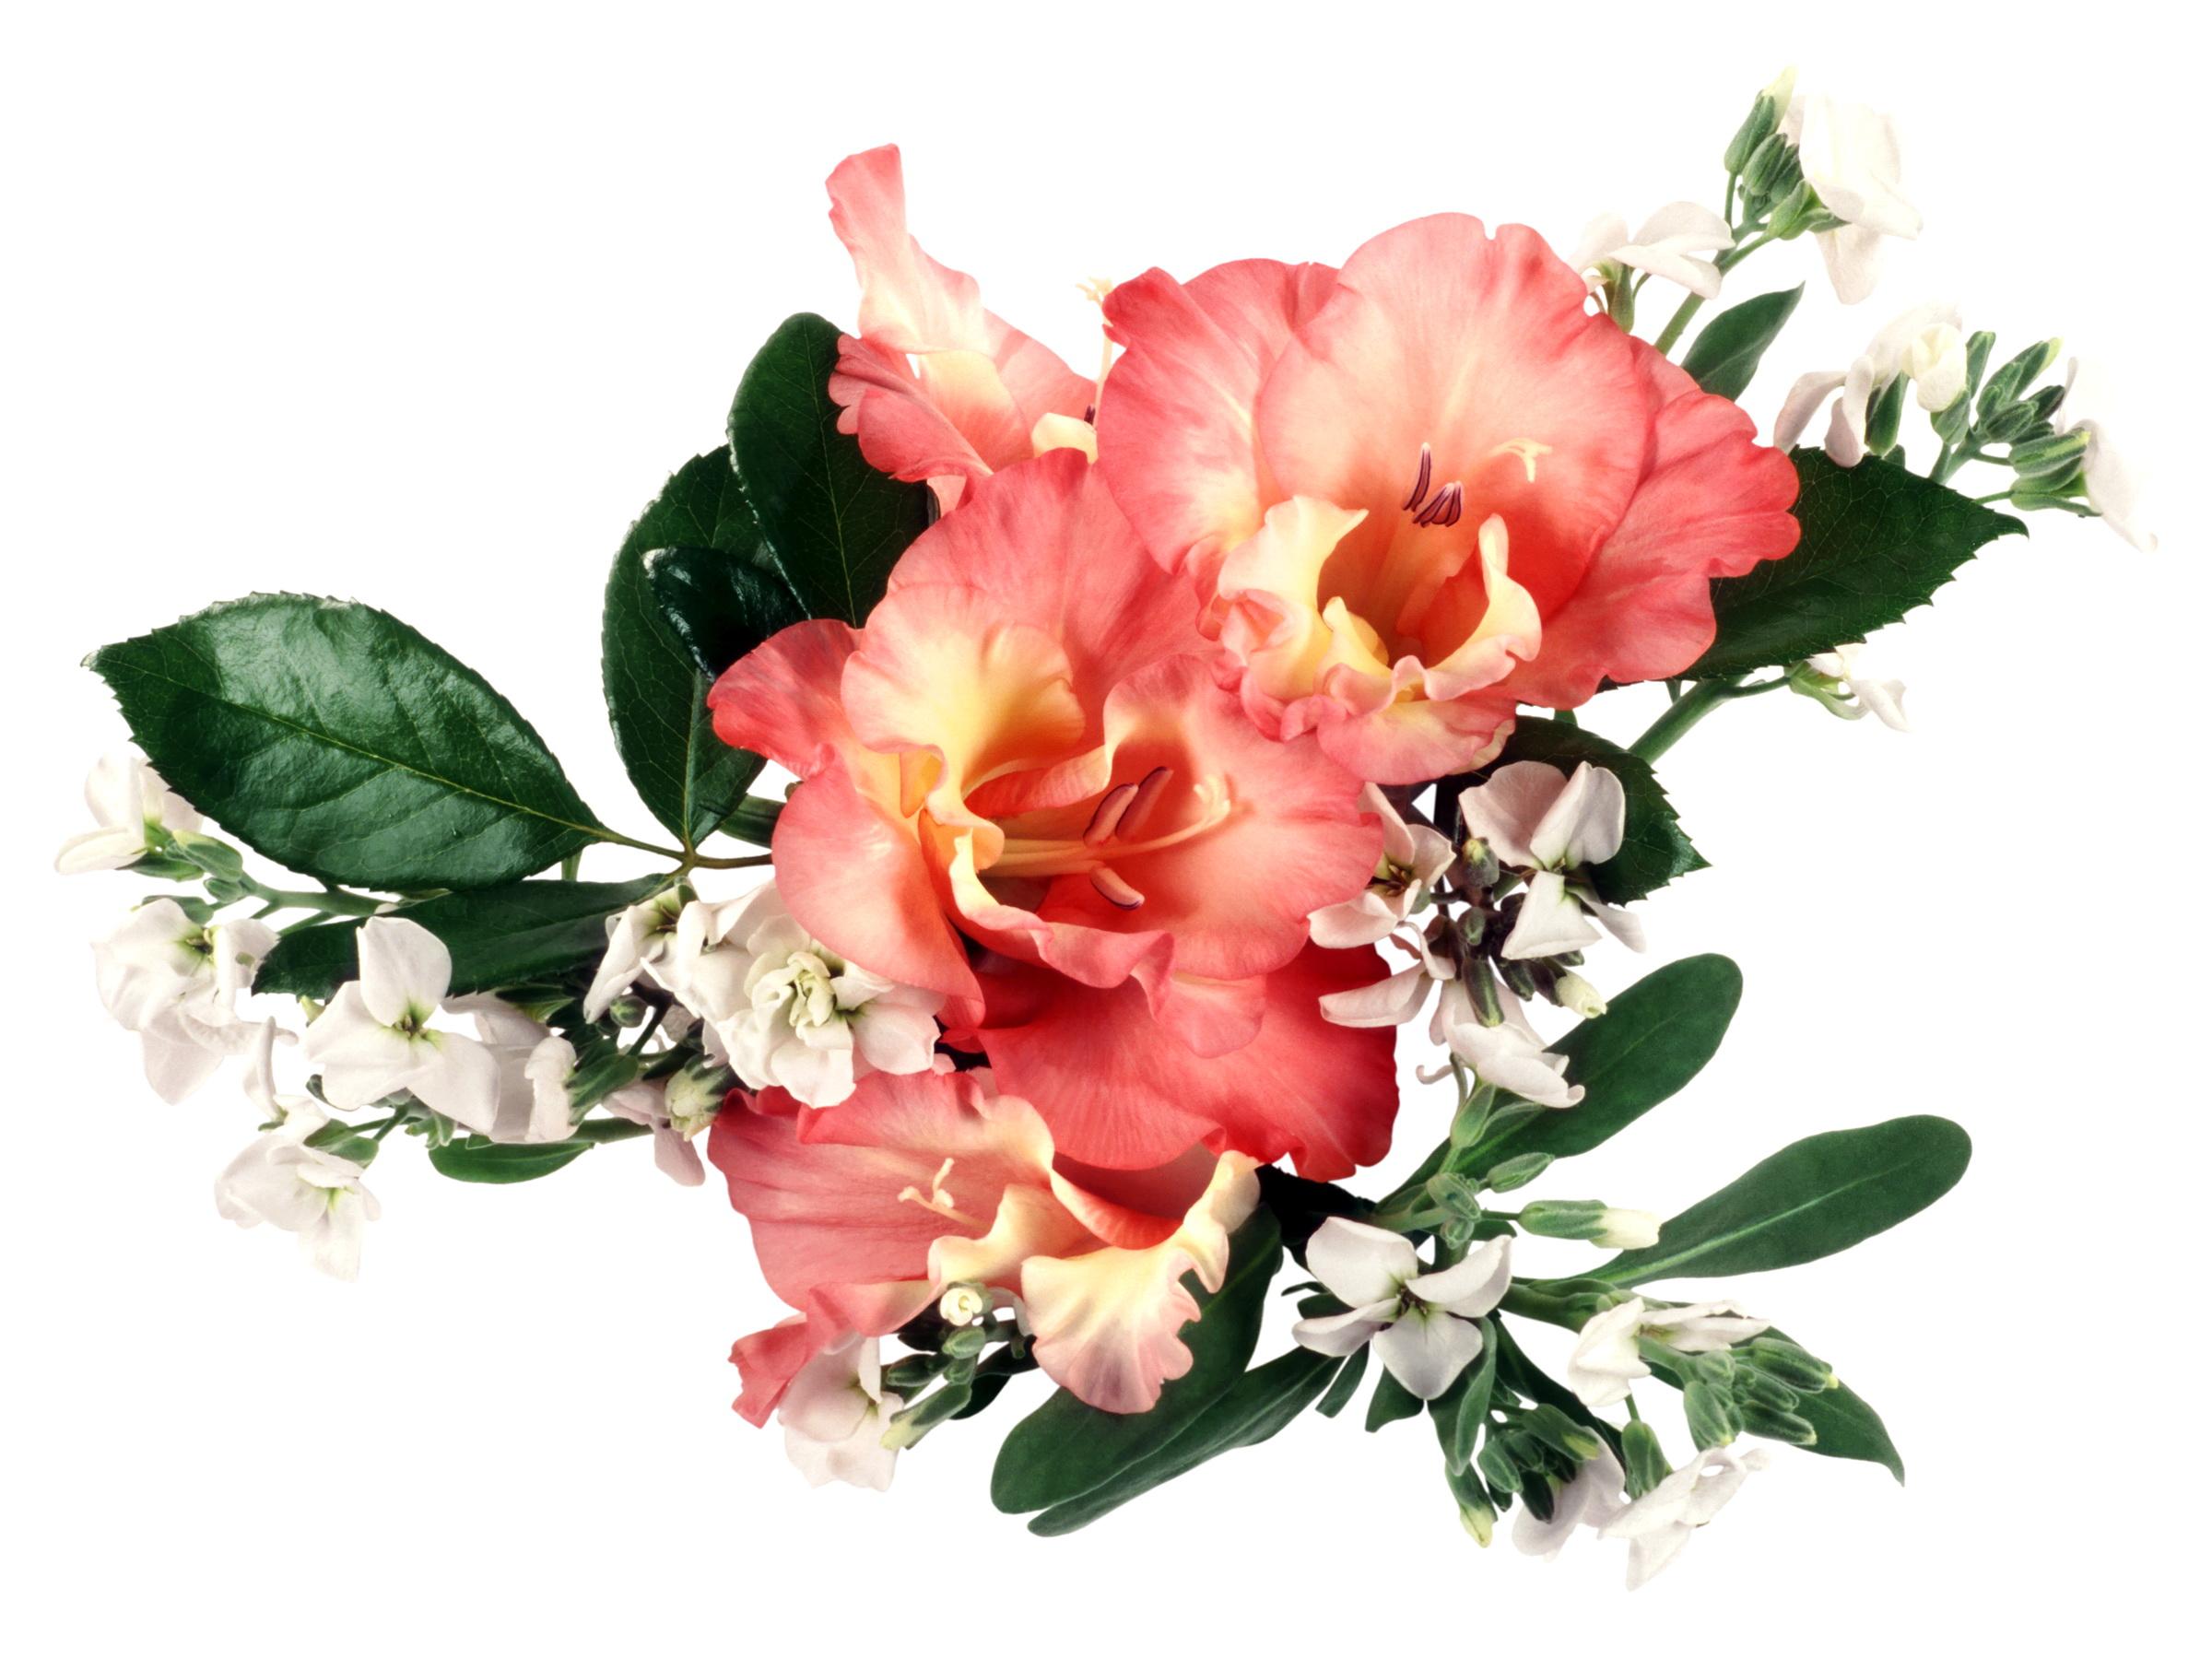 фото цветов гладиолусы: